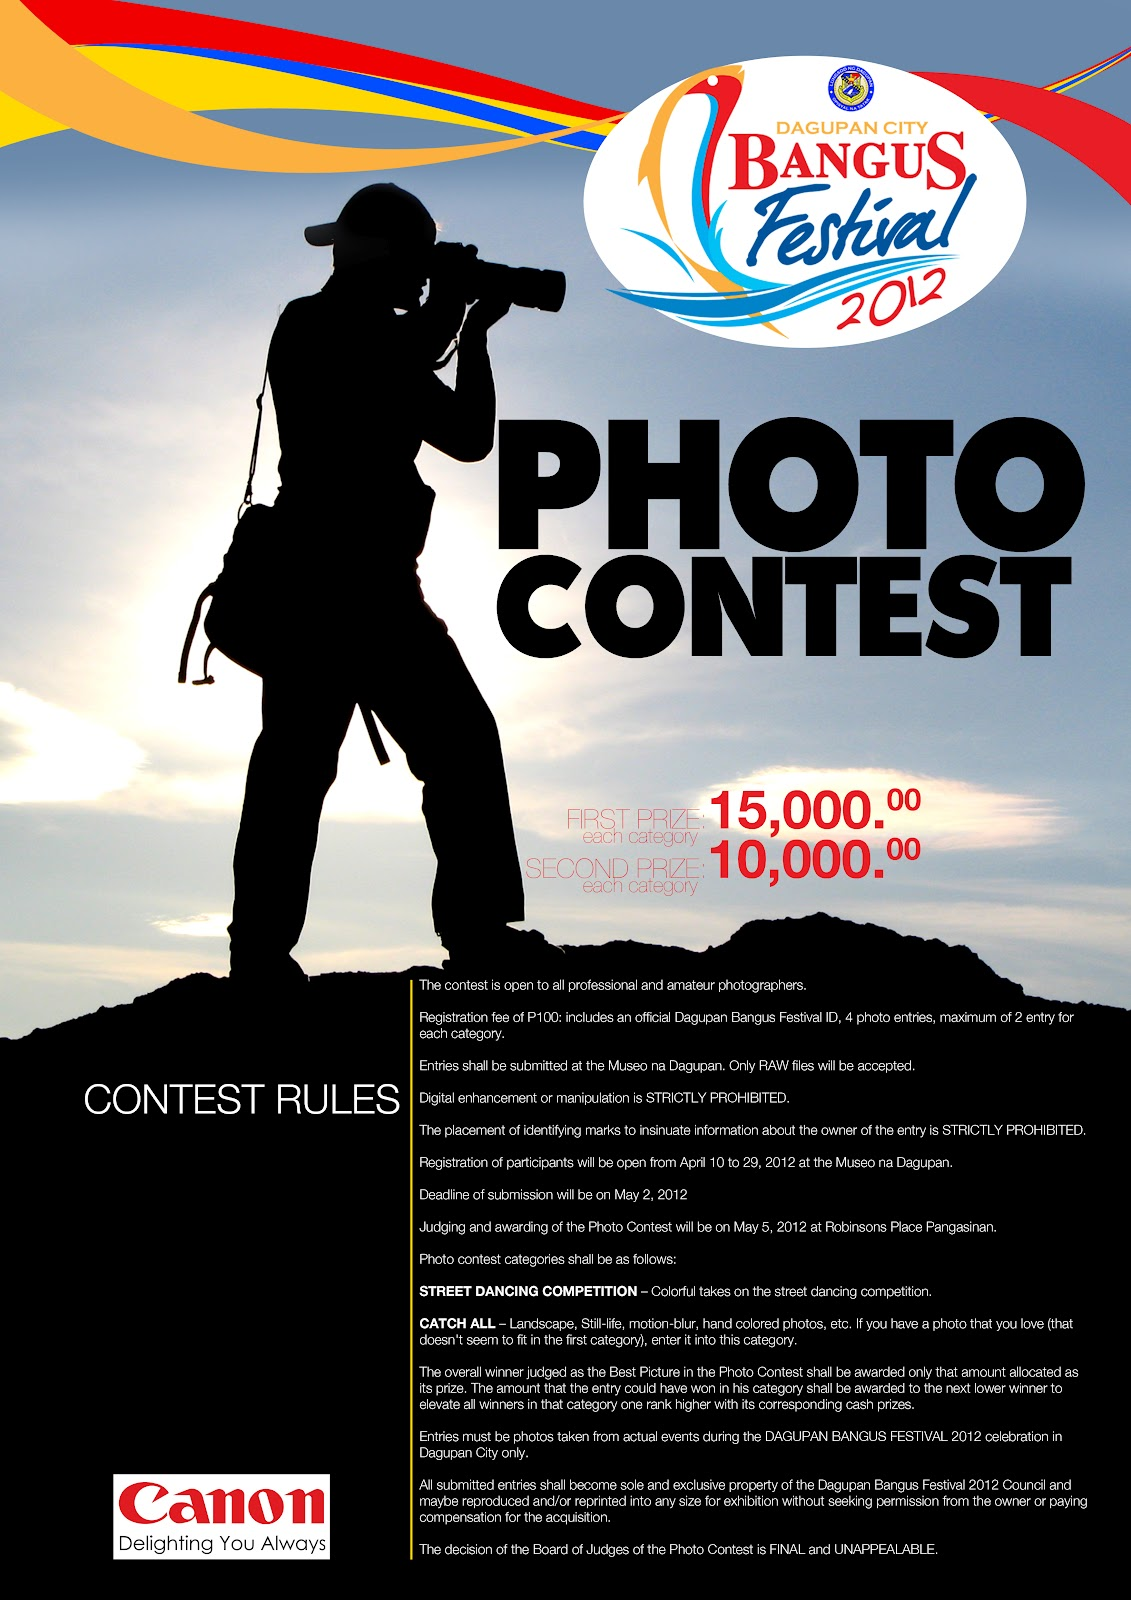 facebook photo contest rules template - what 39 s up dagupan bangus festival 2012 photo contest